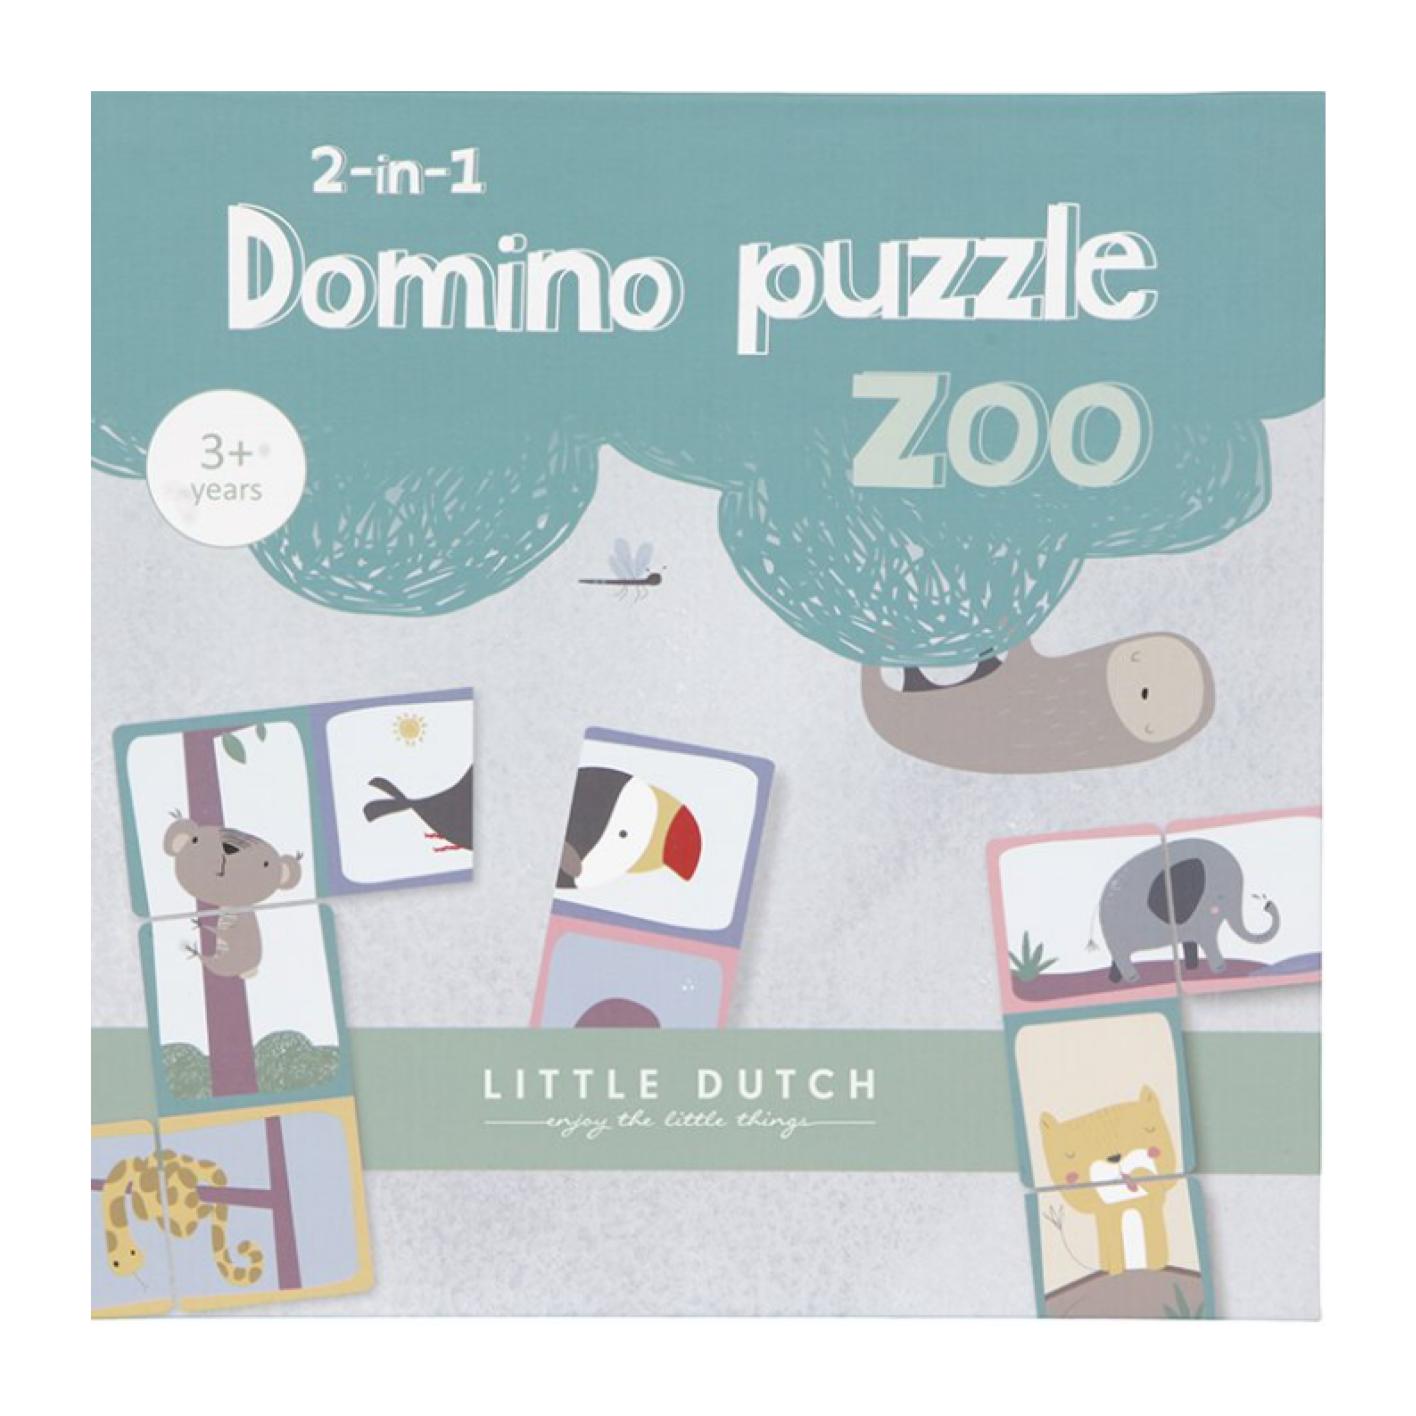 Spel puzzel - Domino amp puzzel in 1 - Dierentuin